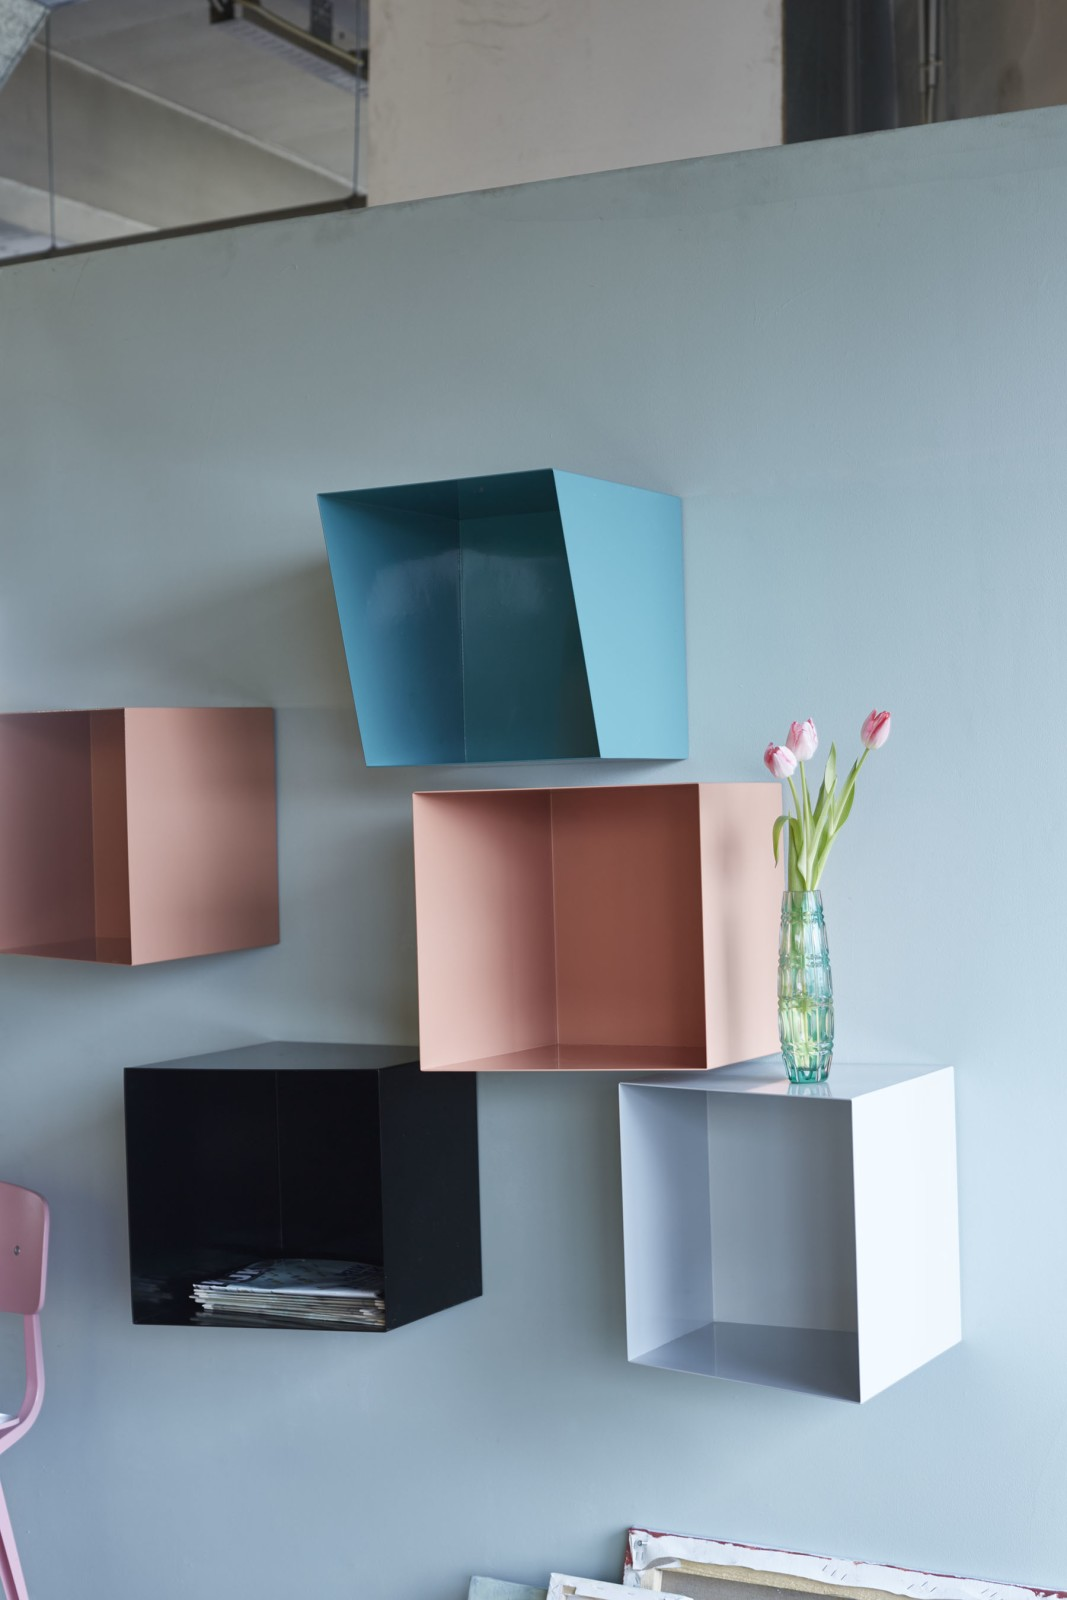 Bookcase TOTEM 6 modular units